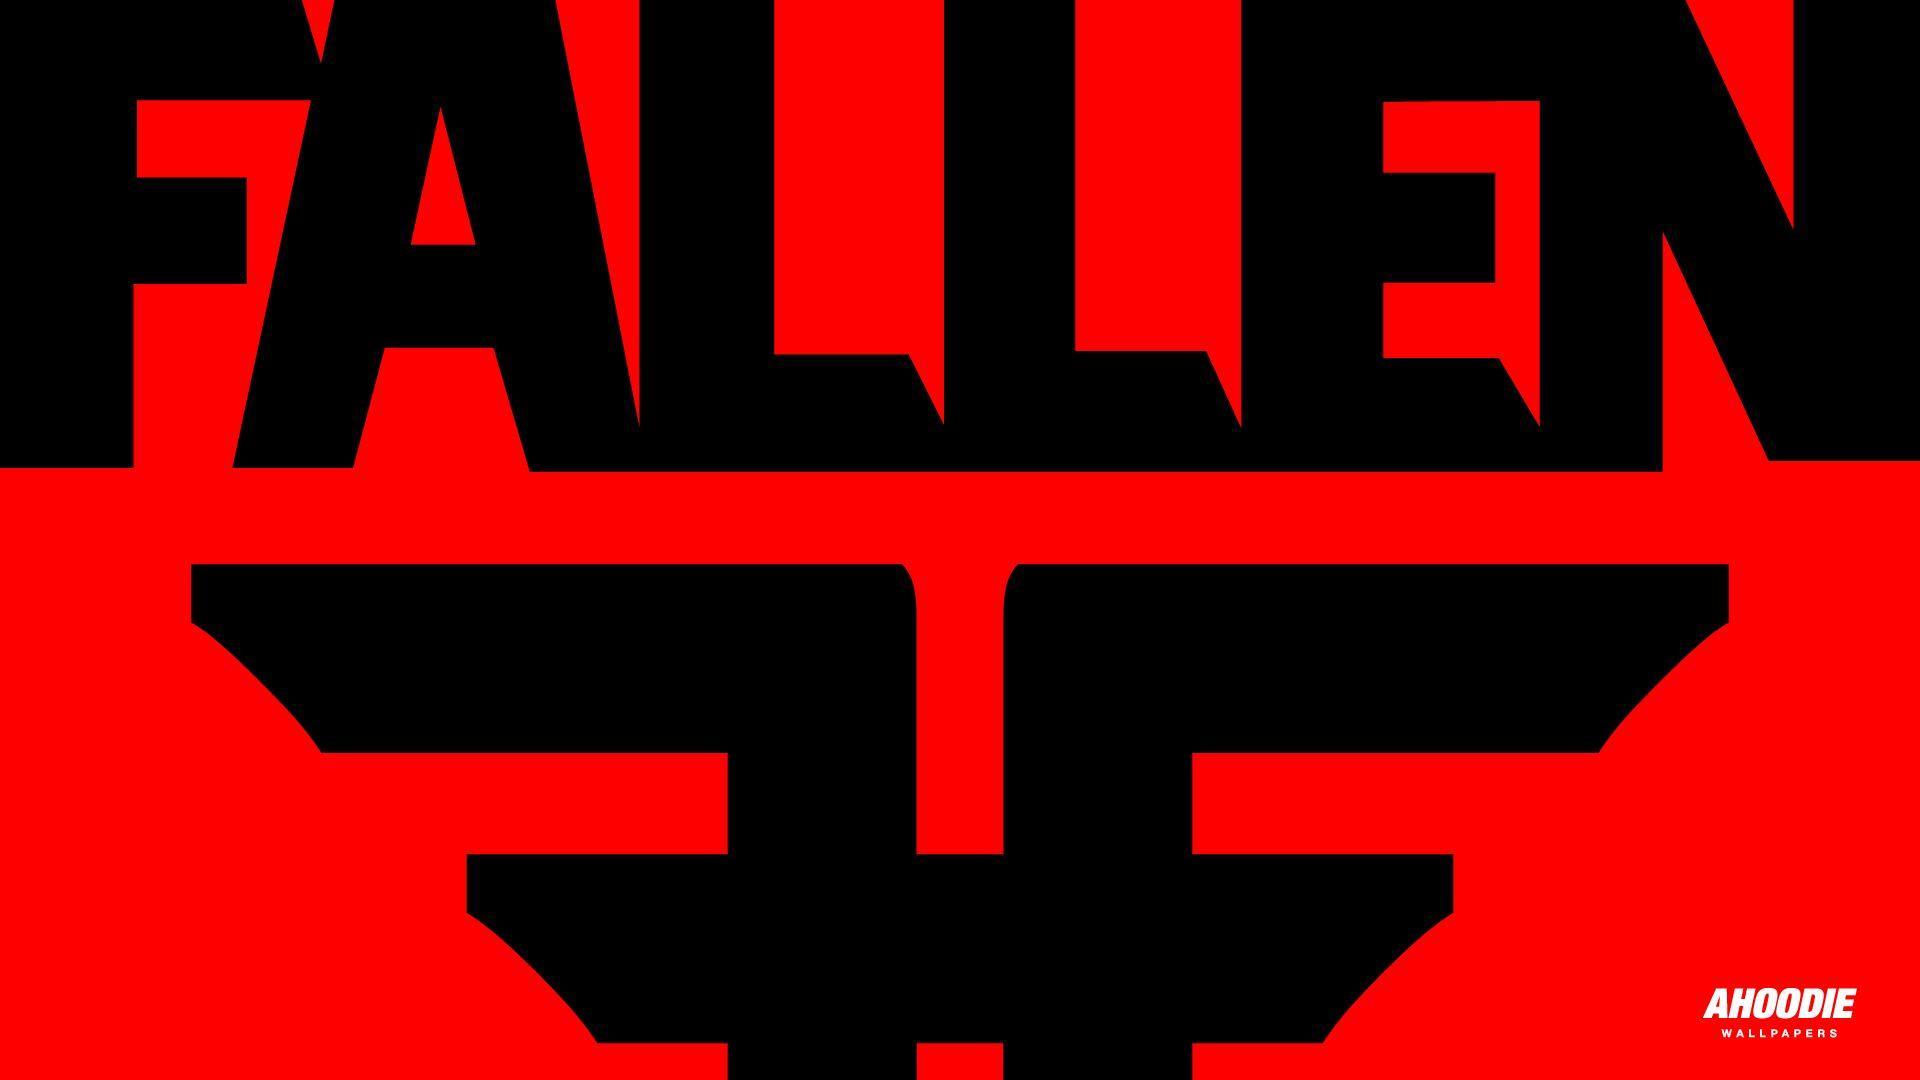 Fallen Wallpapers - Wallpaper Cave Fallen Shoes Logo Wallpaper